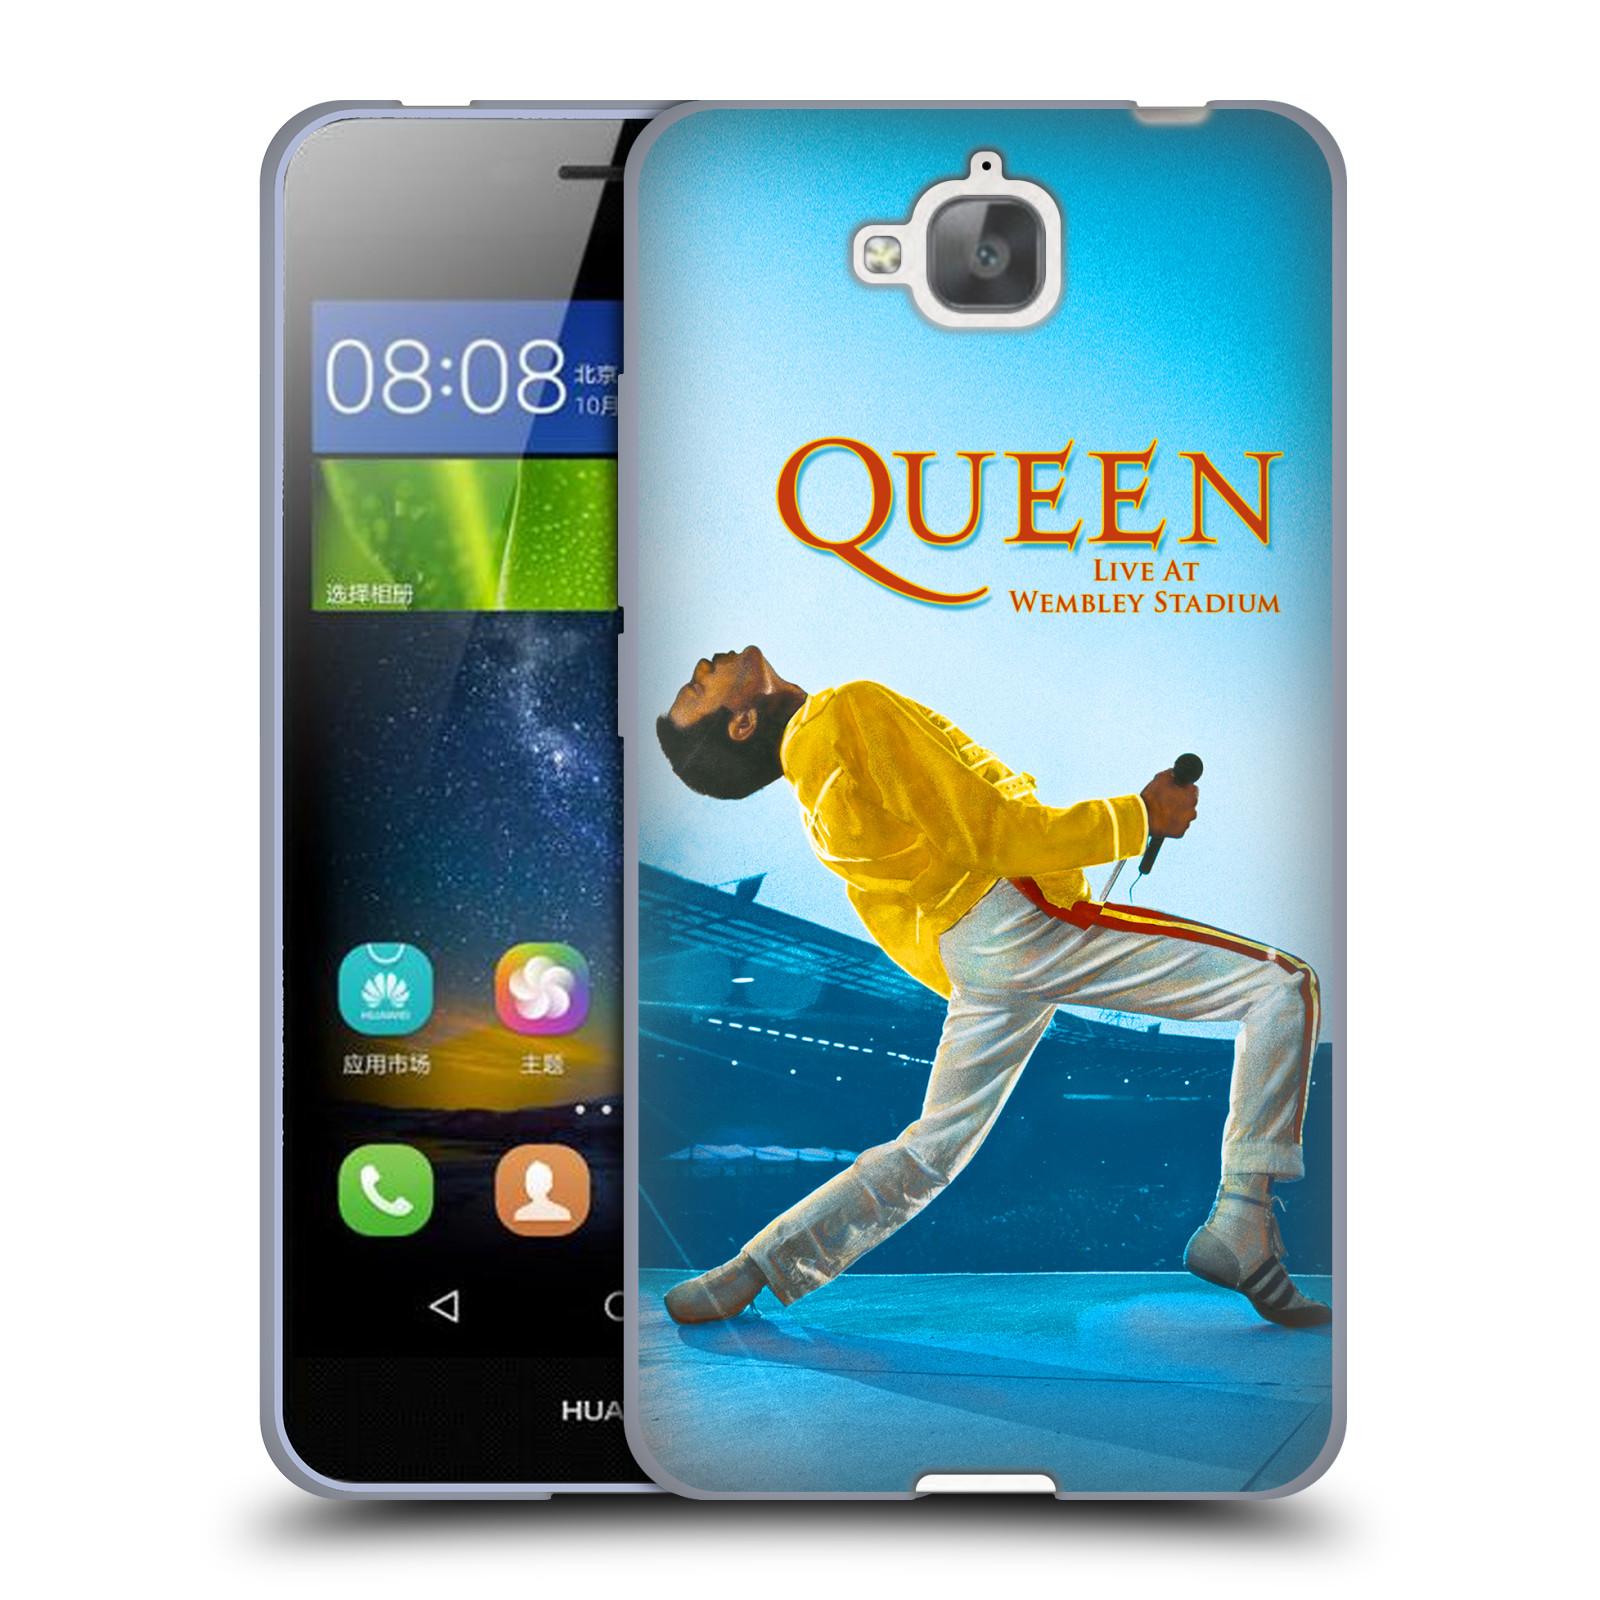 Silikonové pouzdro na mobil Huawei Y6 Pro Dual Sim HEAD CASE Queen - Freddie Mercury